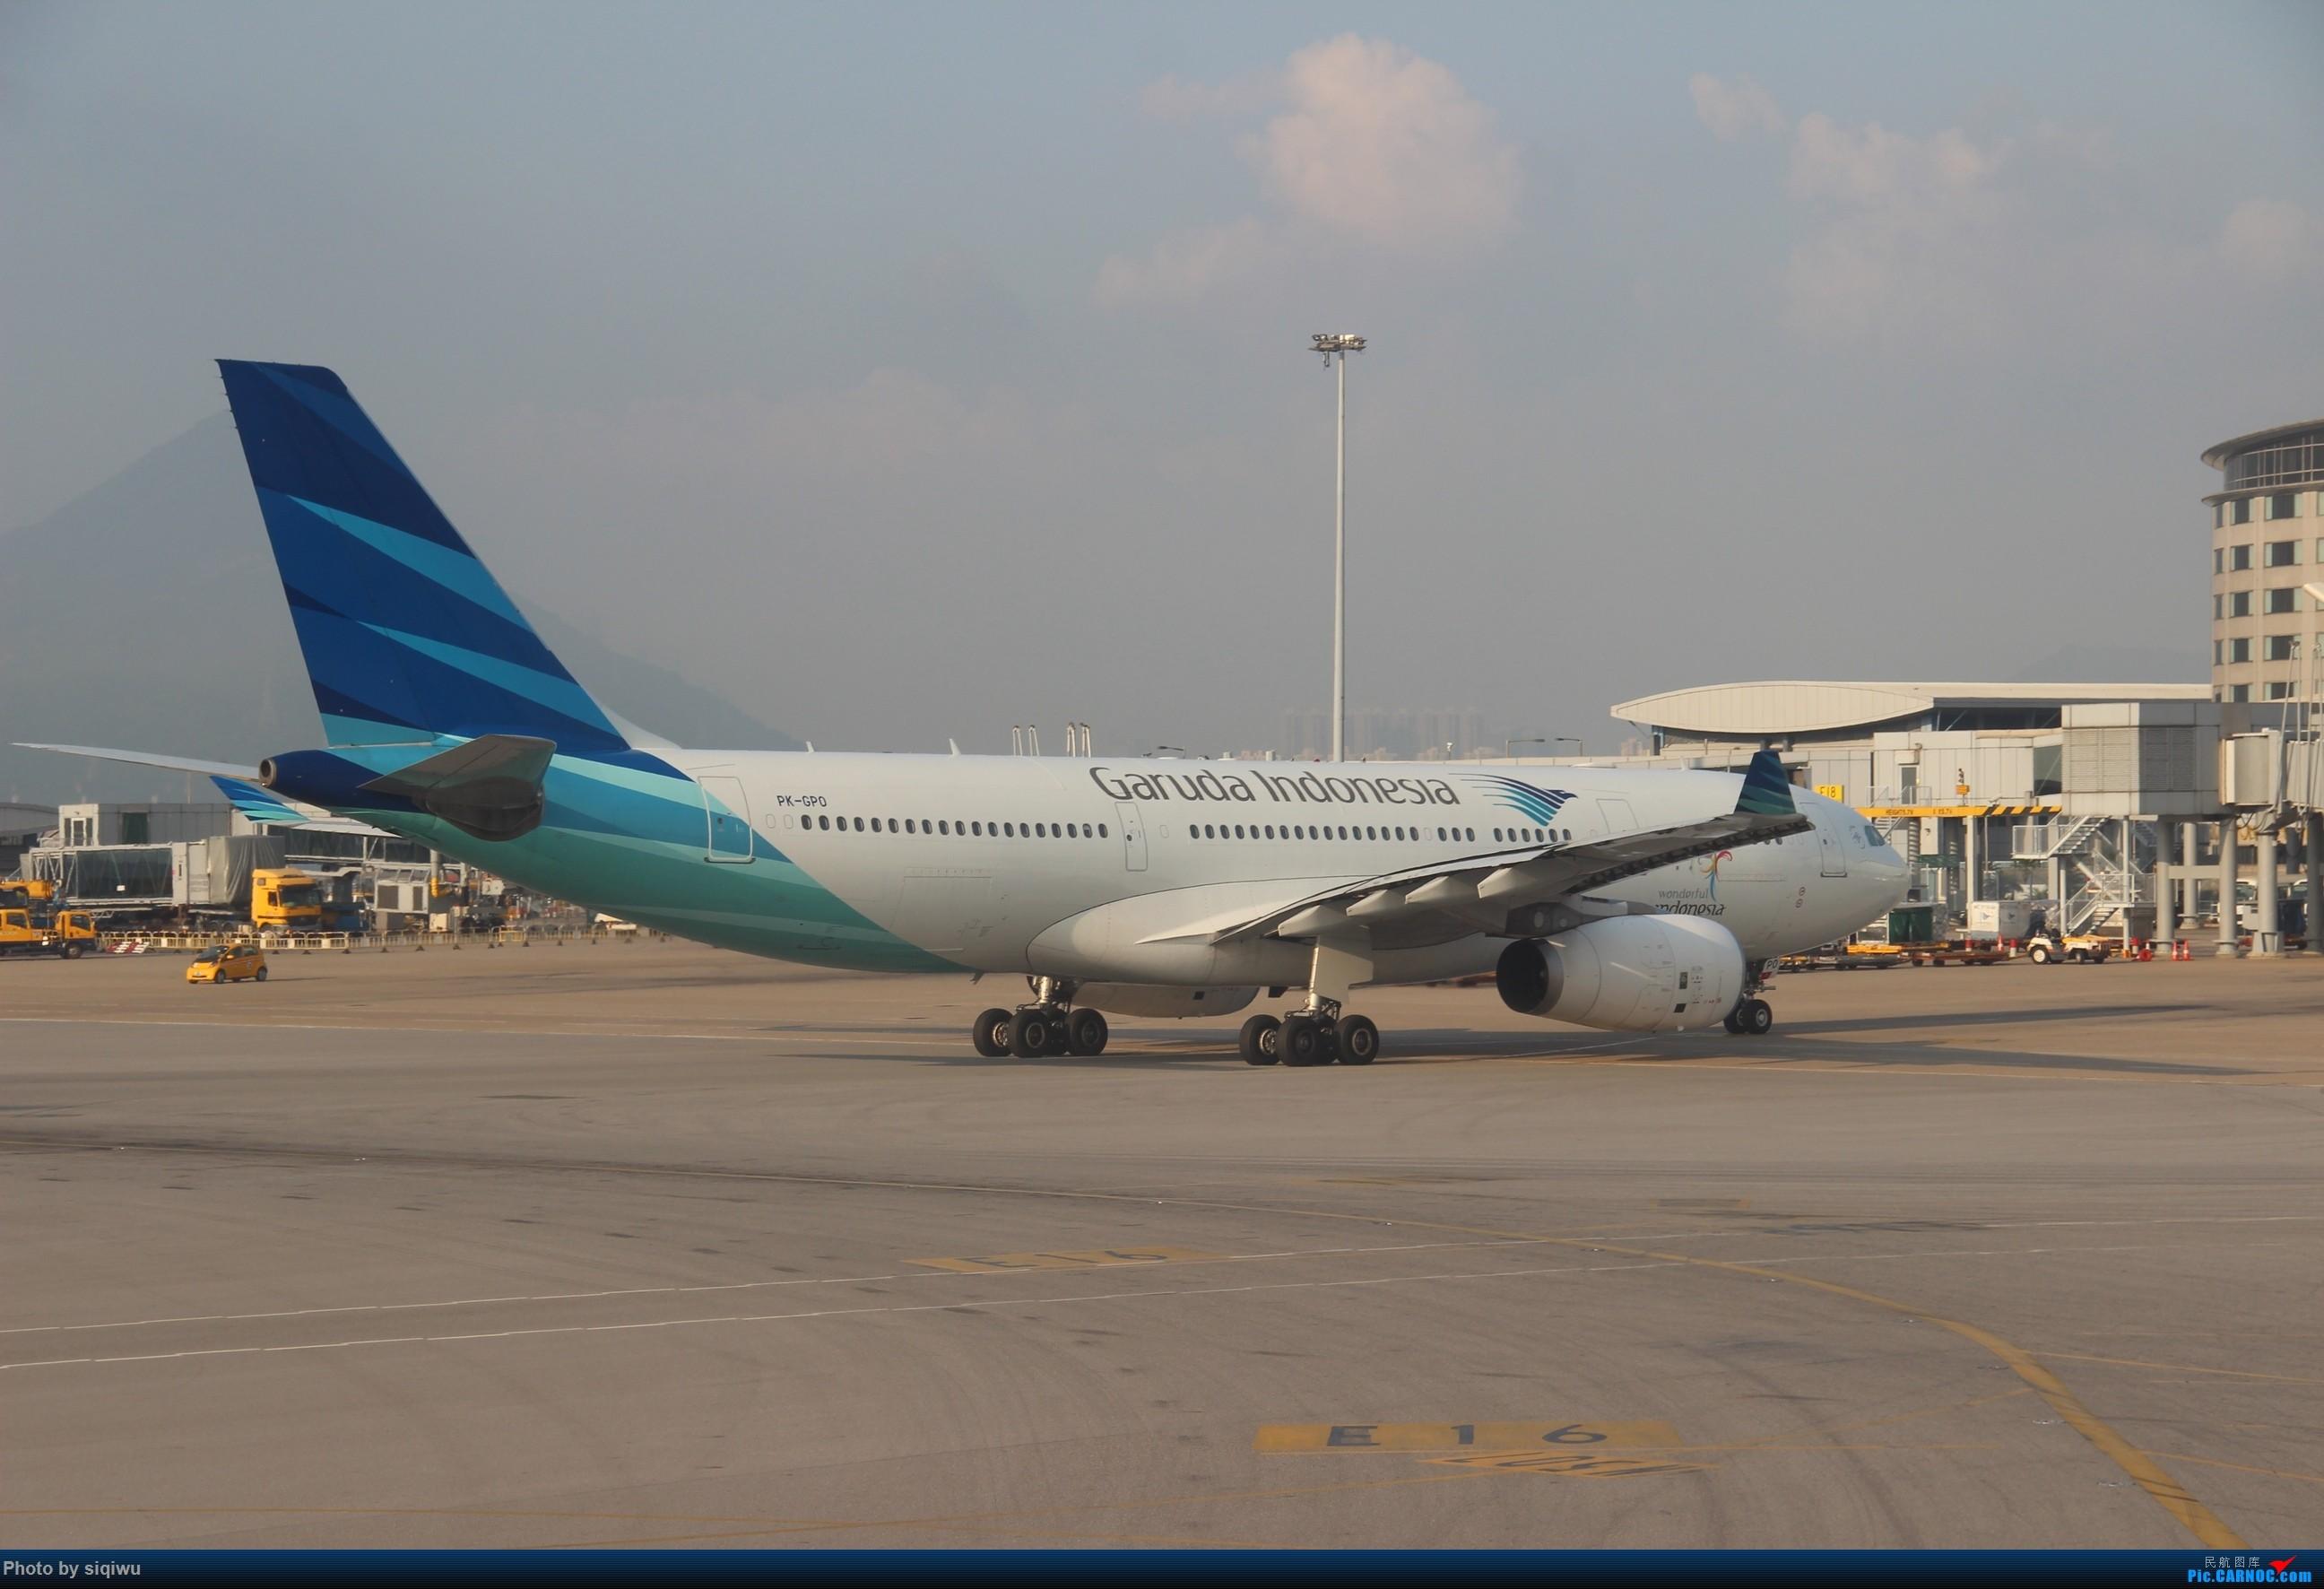 Re:[原创]PVG-HKG-KUL-HKG-PVG 四天往返,CX/KA AIRBUS A330-200  中国香港国际机场